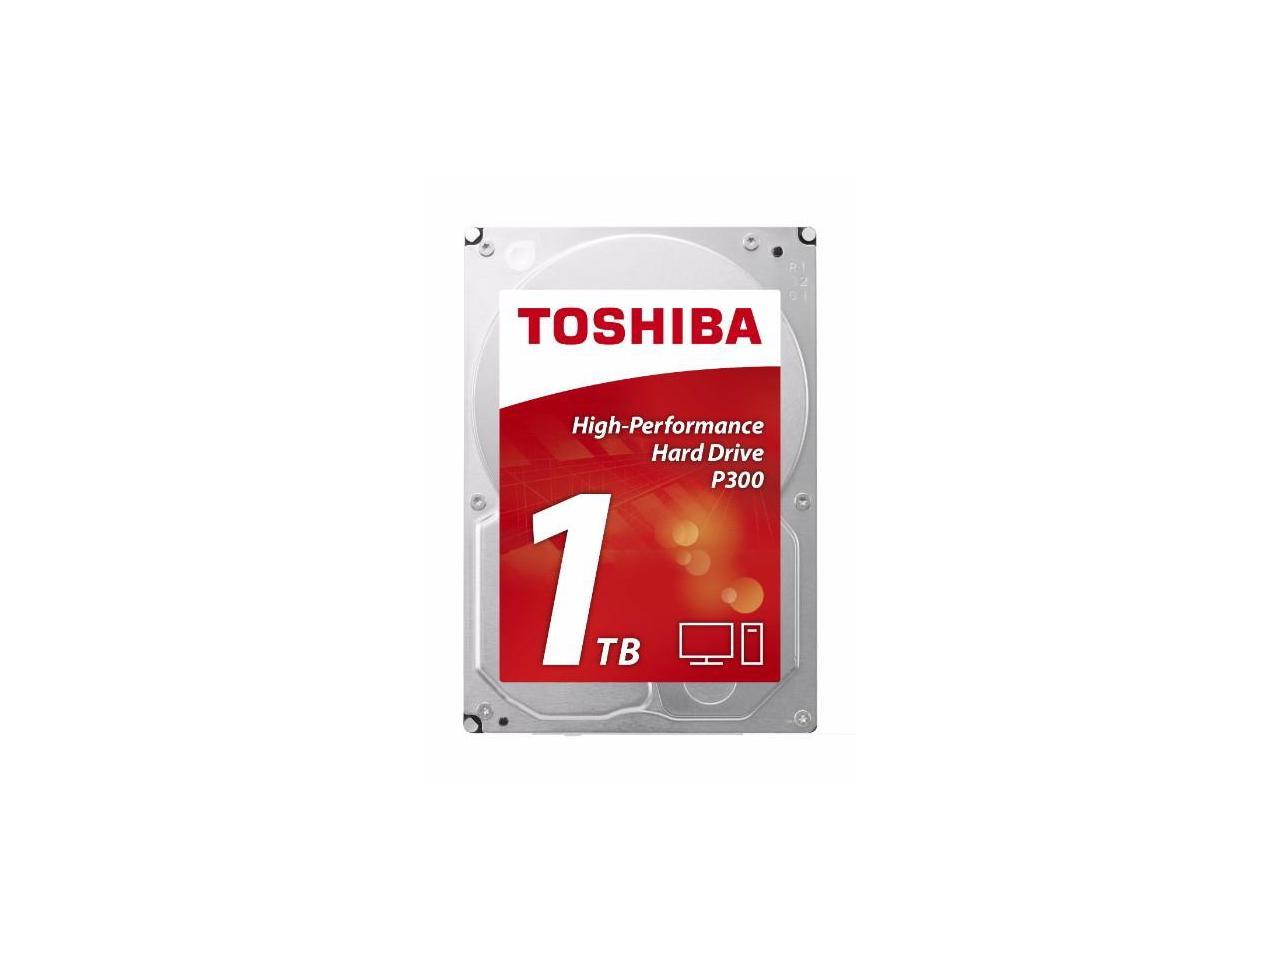 Хард диск TOSHIBA P300, 1TB, 7200rpm, 64MB, SATA 3